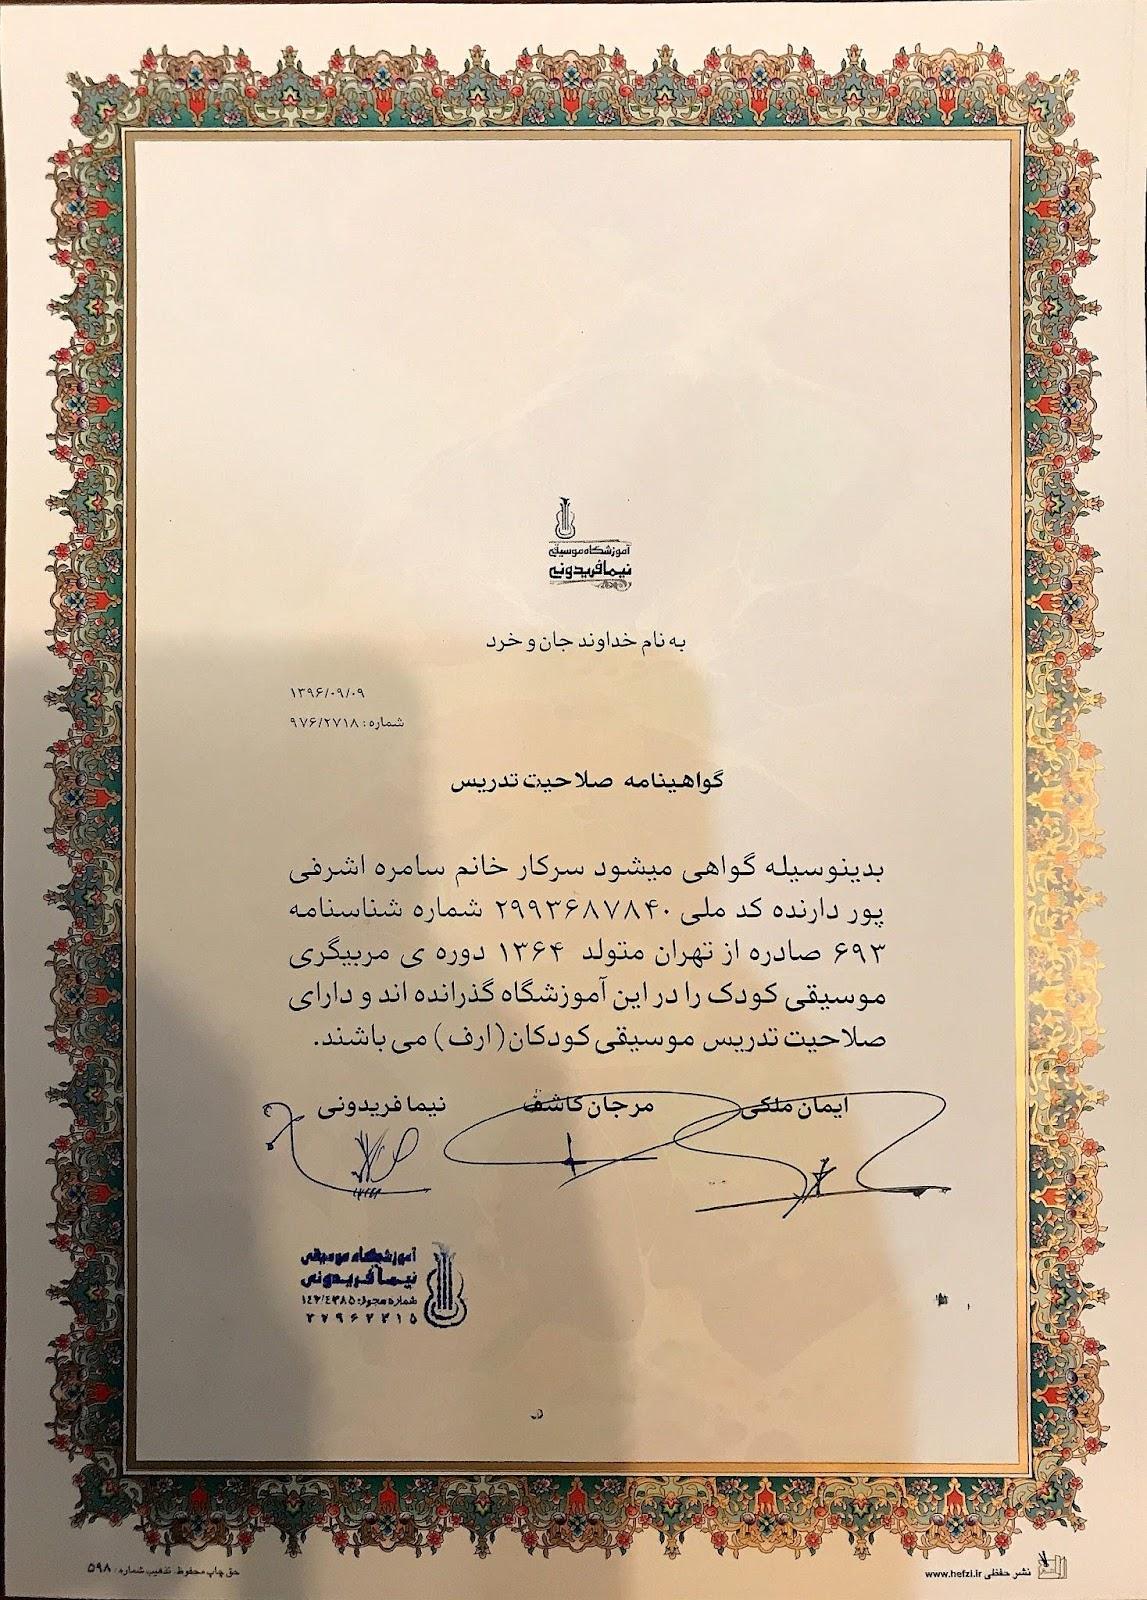 گواهینامه کارت صلاحیت تدریس مربیگری موسیقی کودک ارف سامره اشرفیپور